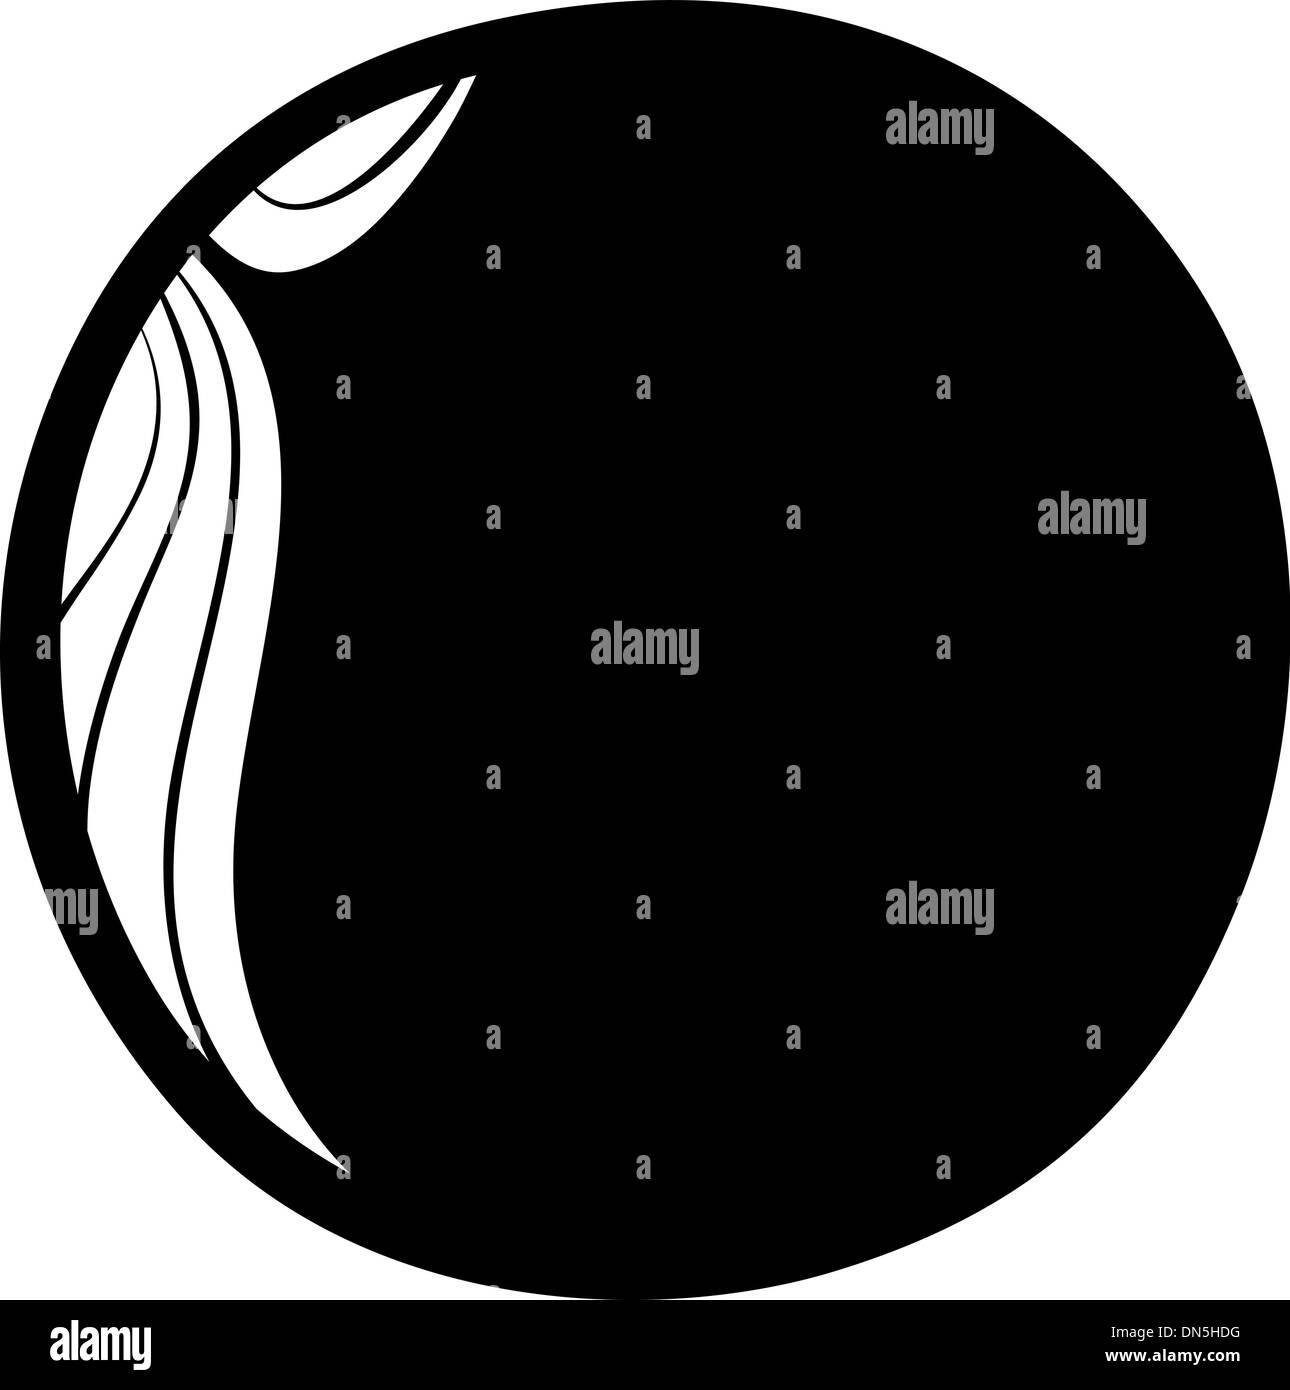 venus planet cartoon coloring page - Stock Image